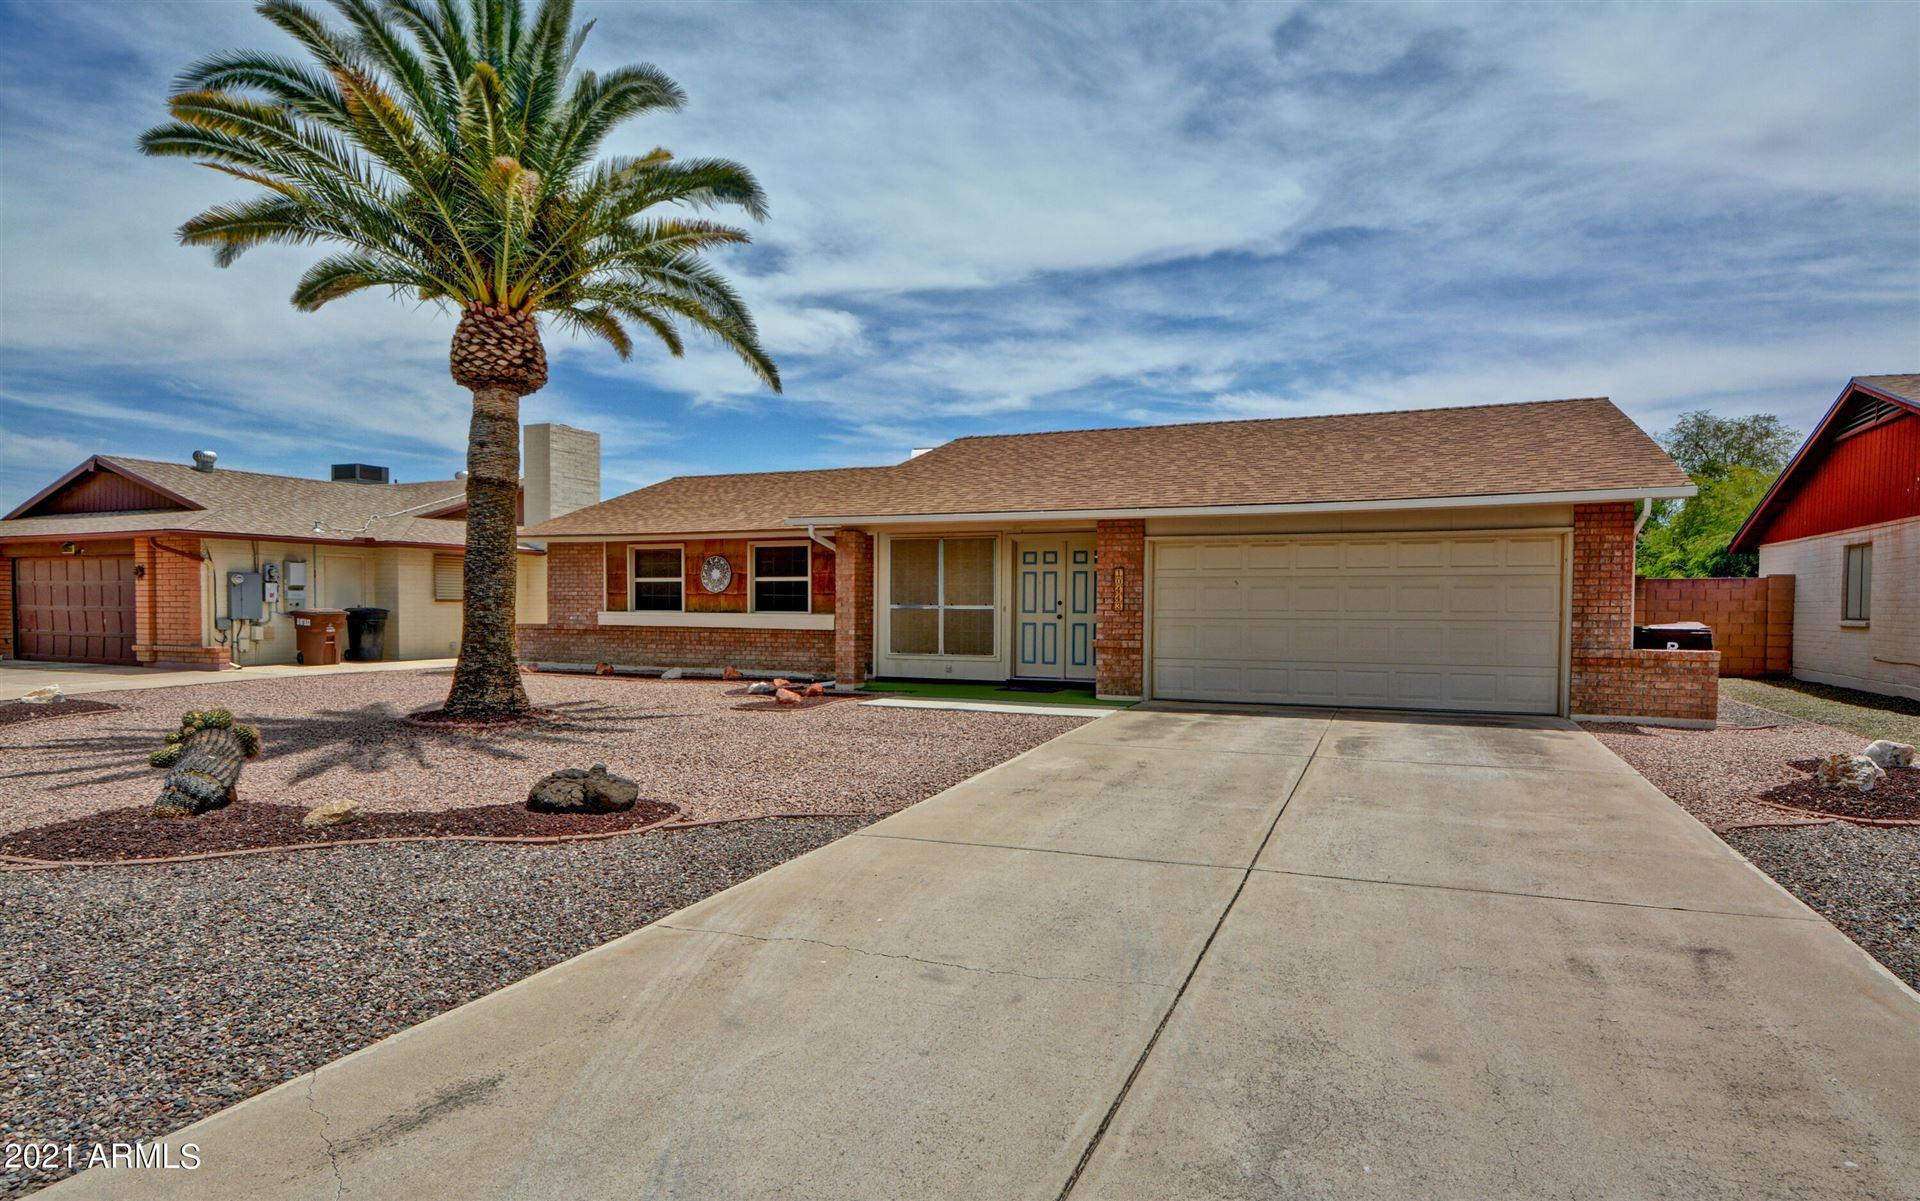 Photo of 10443 W BUTLER Drive, Peoria, AZ 85345 (MLS # 6235563)